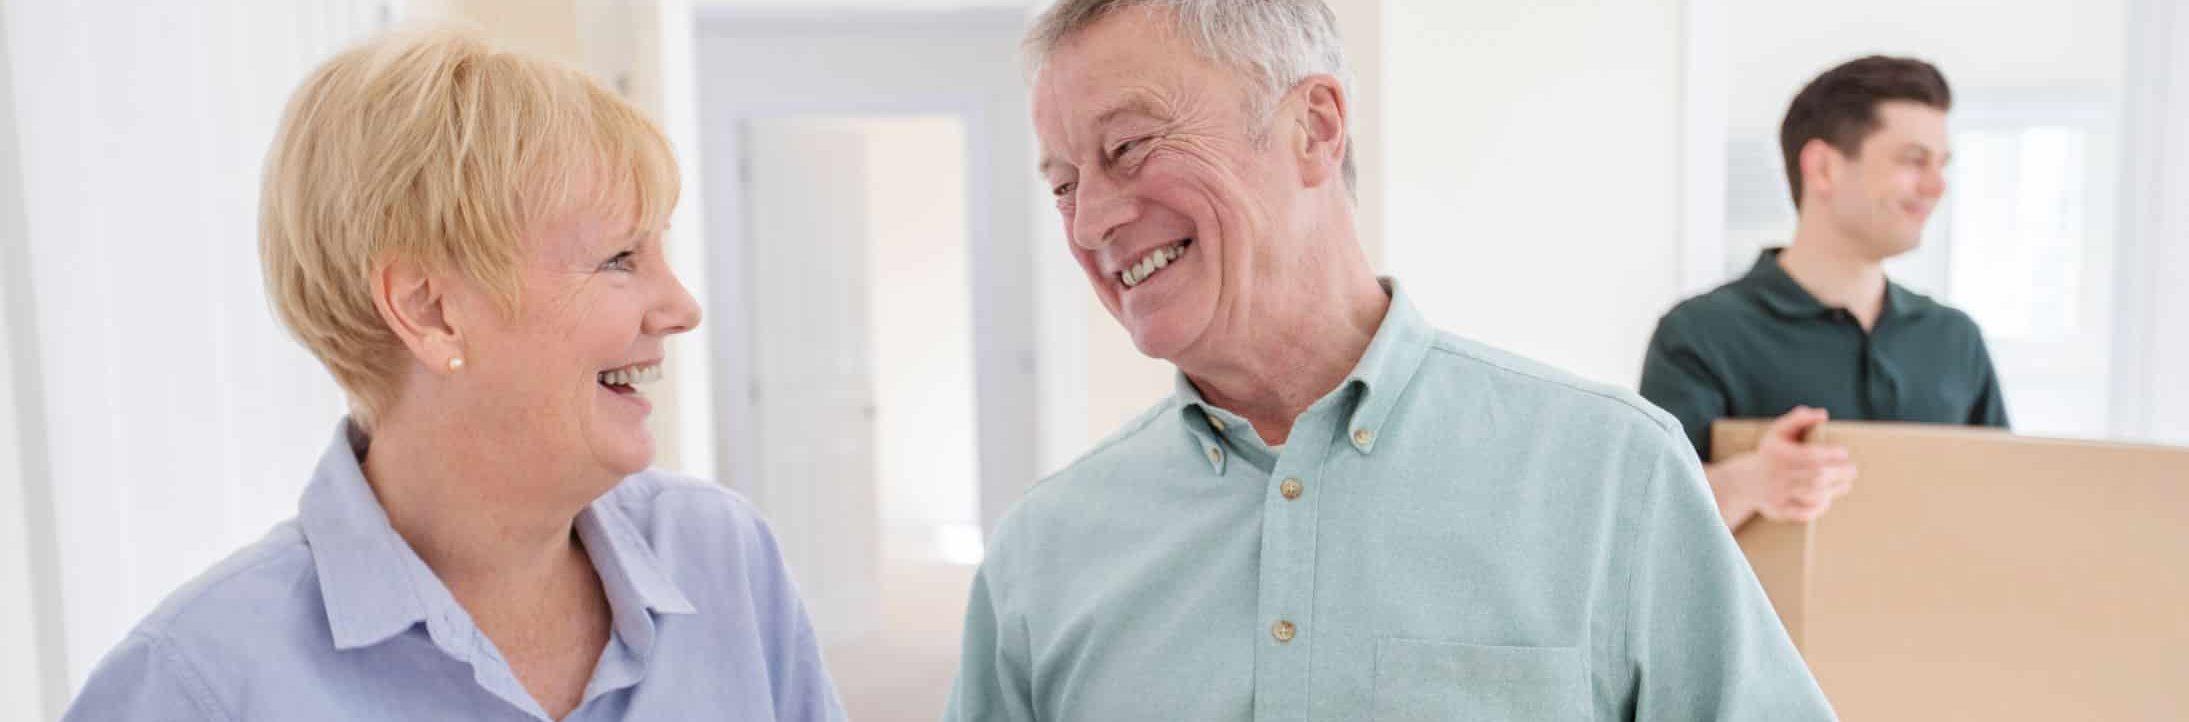 smiling seniors moving